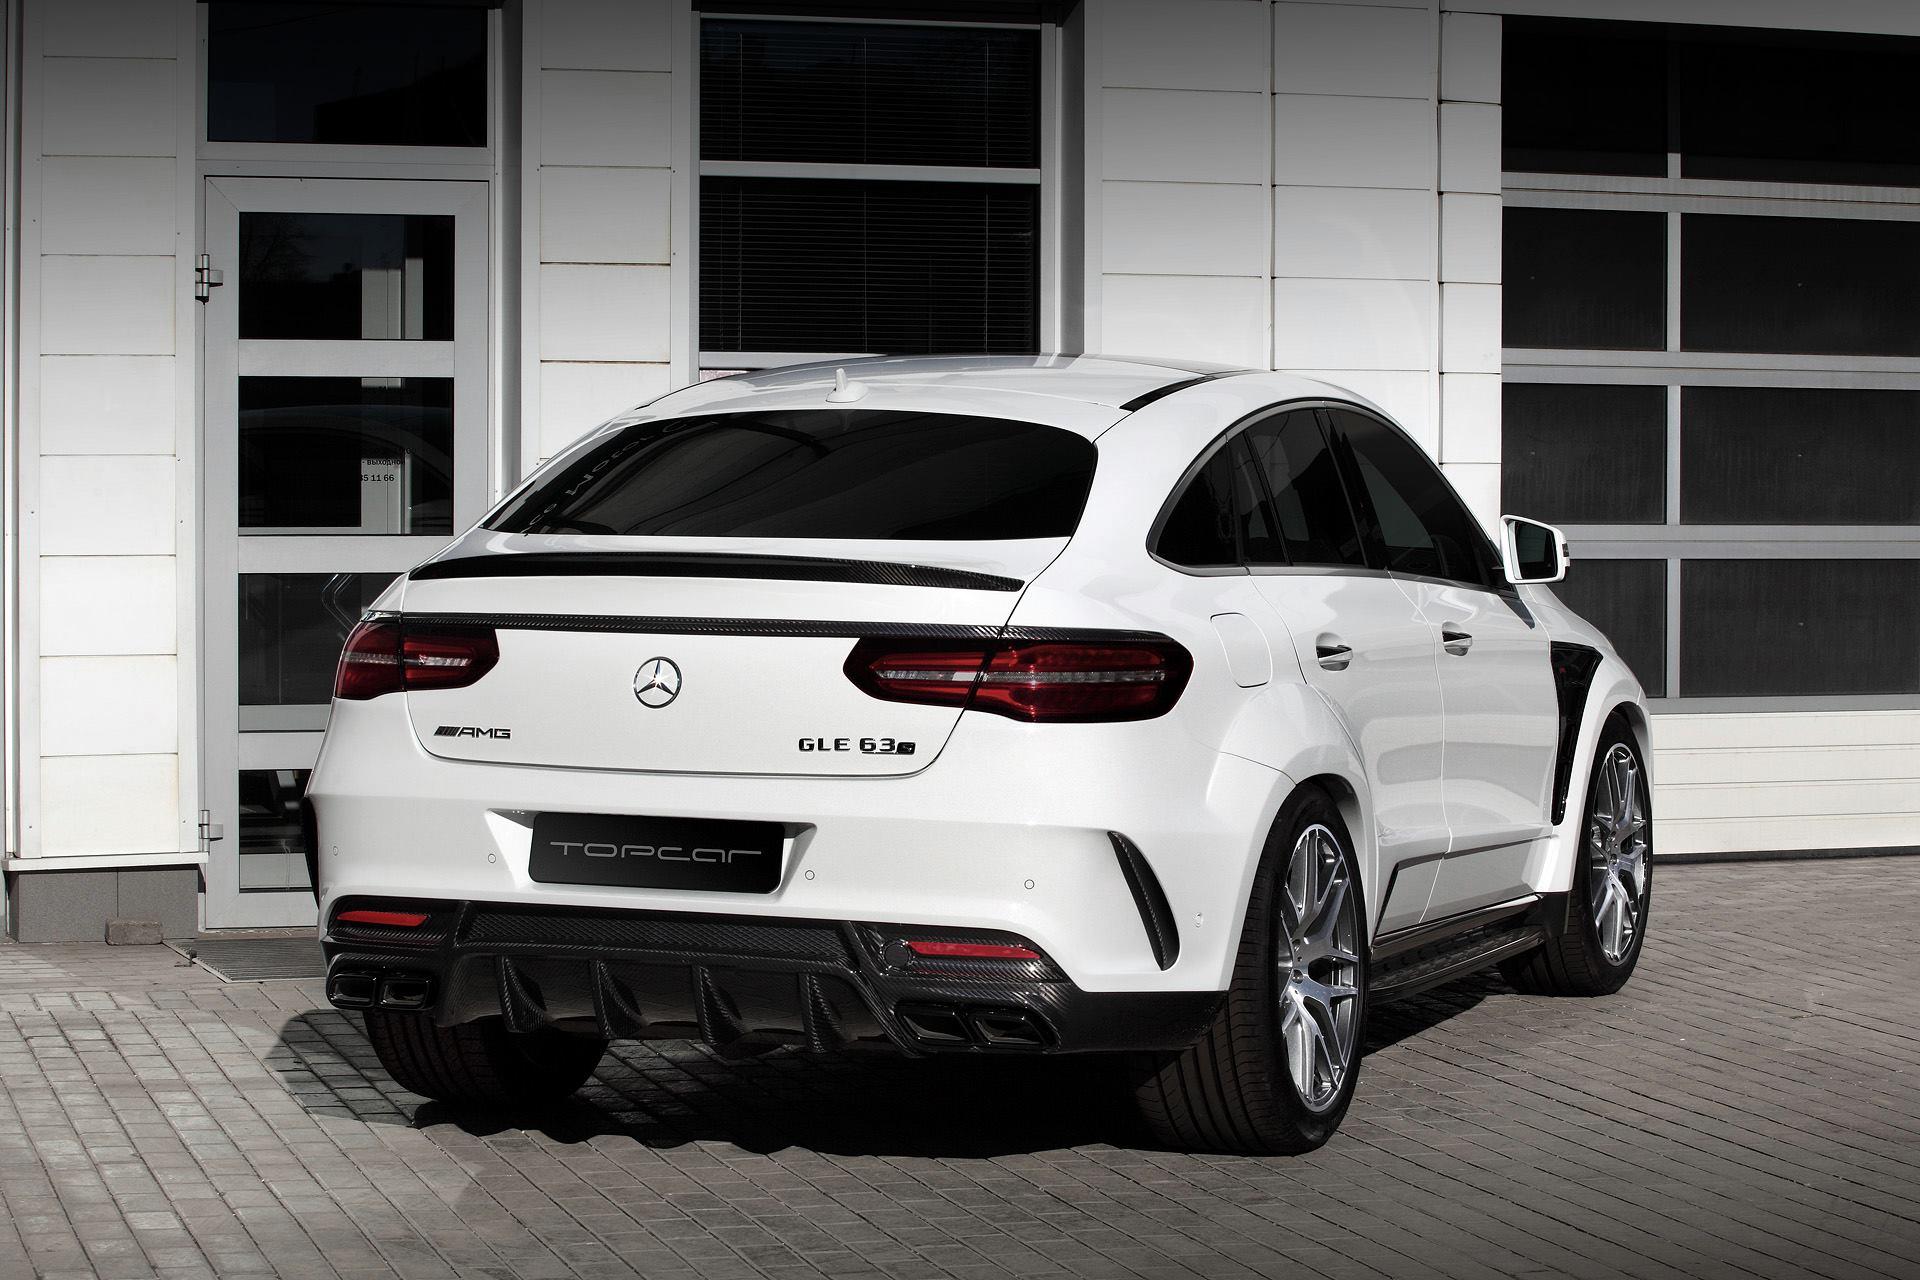 Mercedes Suv Coupe : white mercedes gle coupe 63s with topcar inferno kit has carbon details autoevolution ~ Medecine-chirurgie-esthetiques.com Avis de Voitures